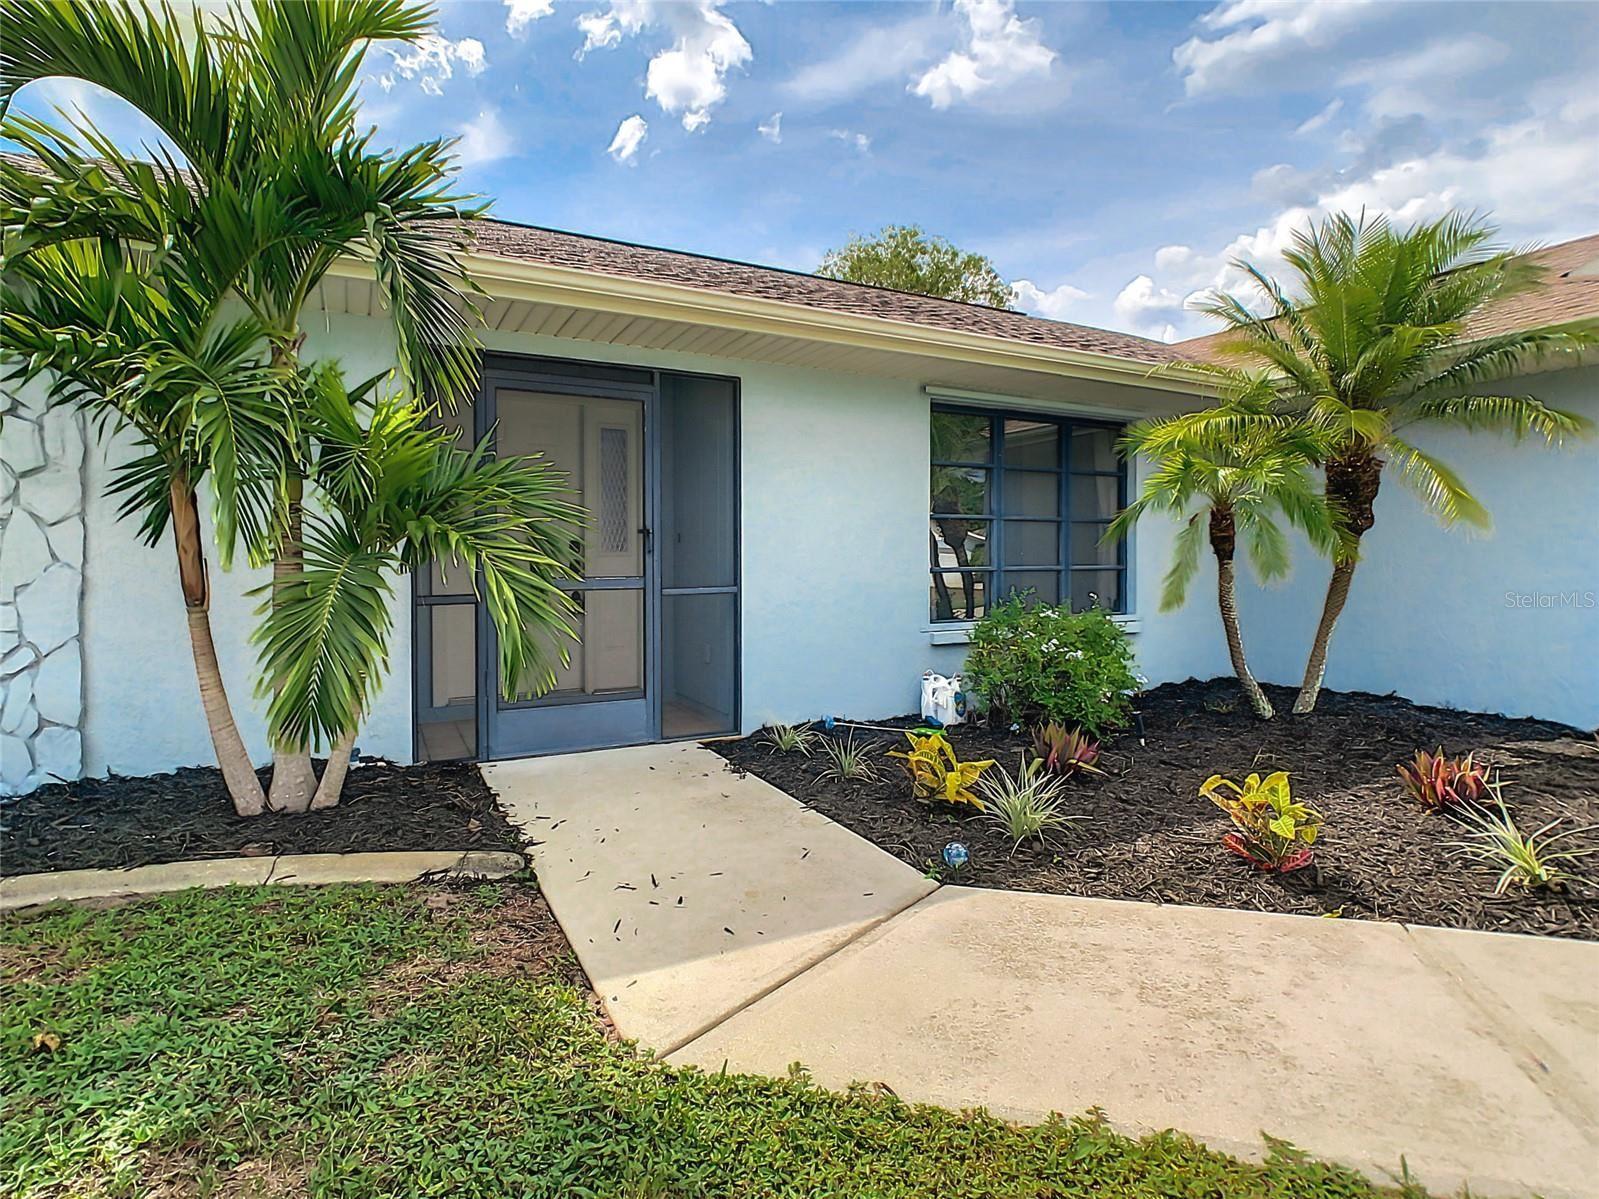 Photo of 14 BUNKER PLACE, ROTONDA WEST, FL 33947 (MLS # D6119262)